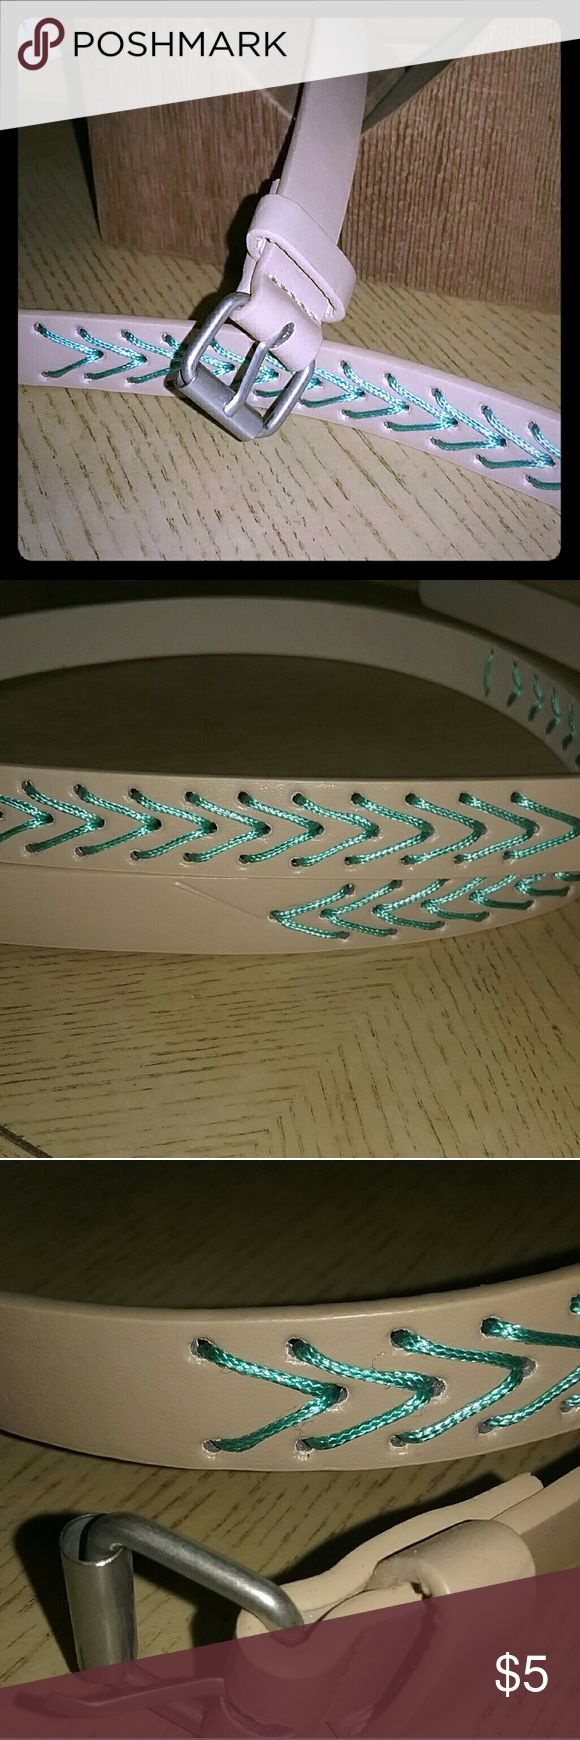 Chevron belt Tan belt with blueish green chevron pattern. Size 3. 2cm in width. I have never worn this belt. SUPER CUTE! Accessories Belts